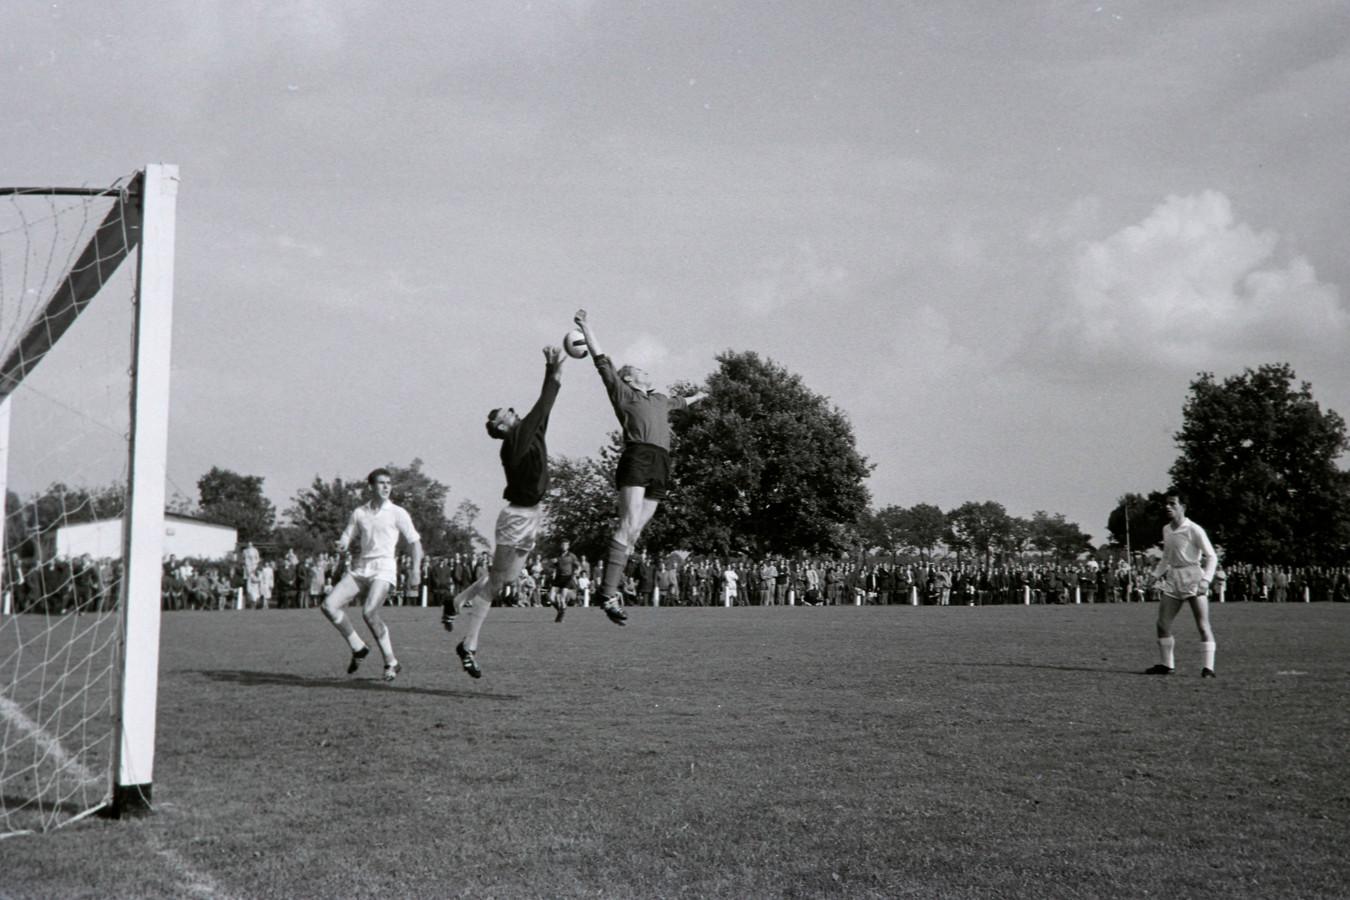 Wedstrijd PVV - Mierlo-Hout in Helmond op 12 september 1965